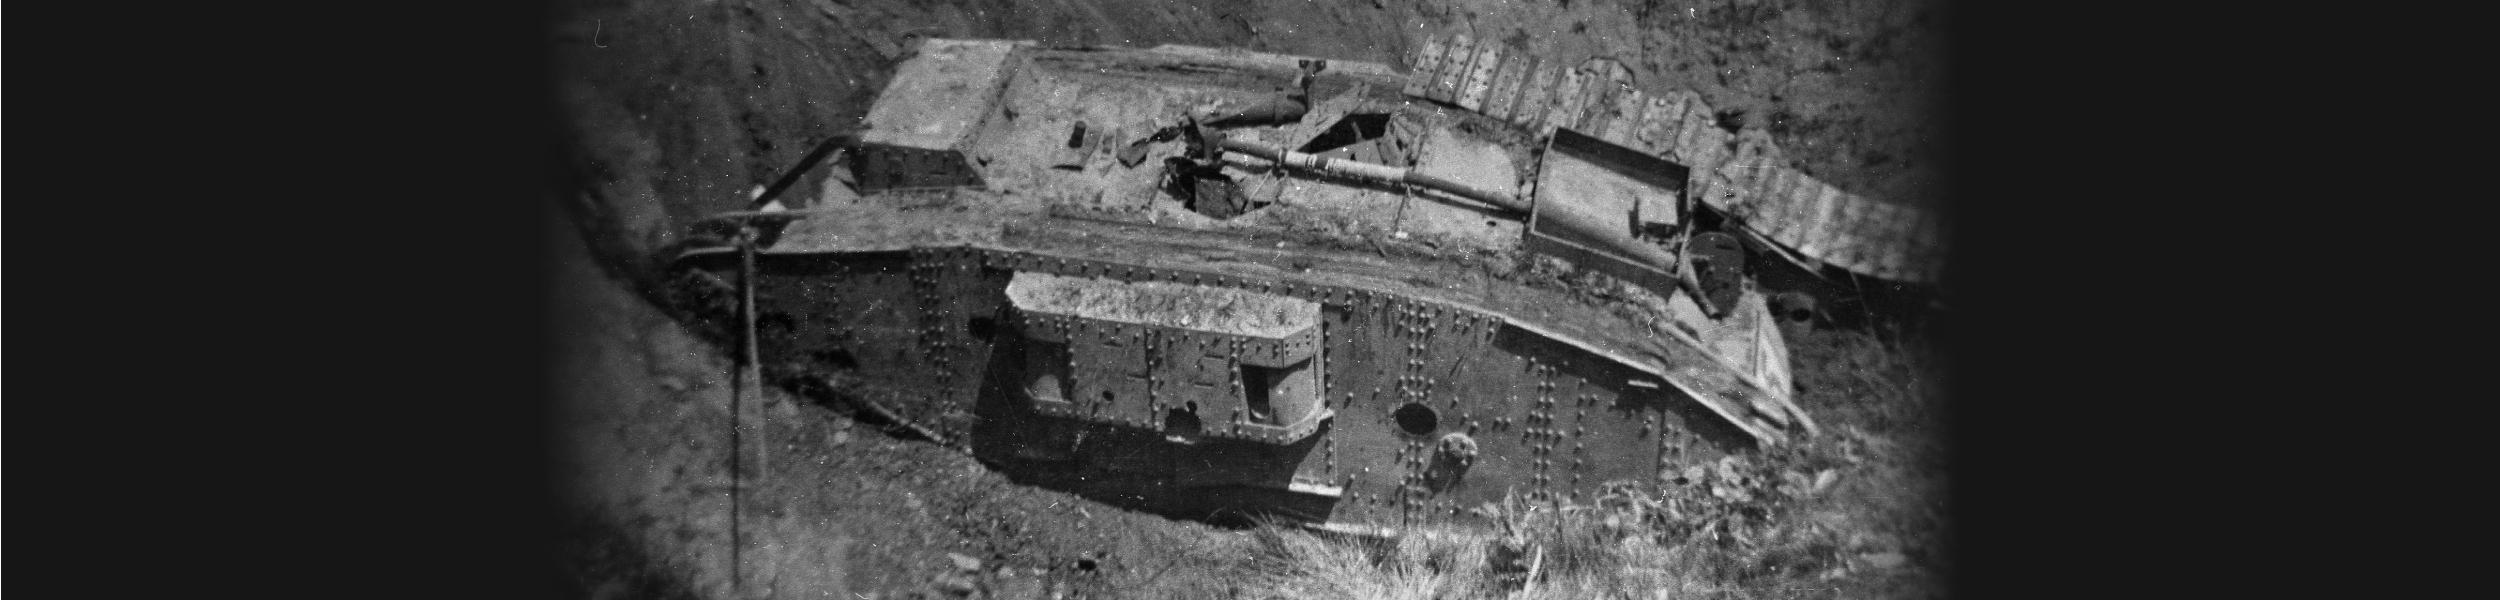 'Burying-of-a-tank'